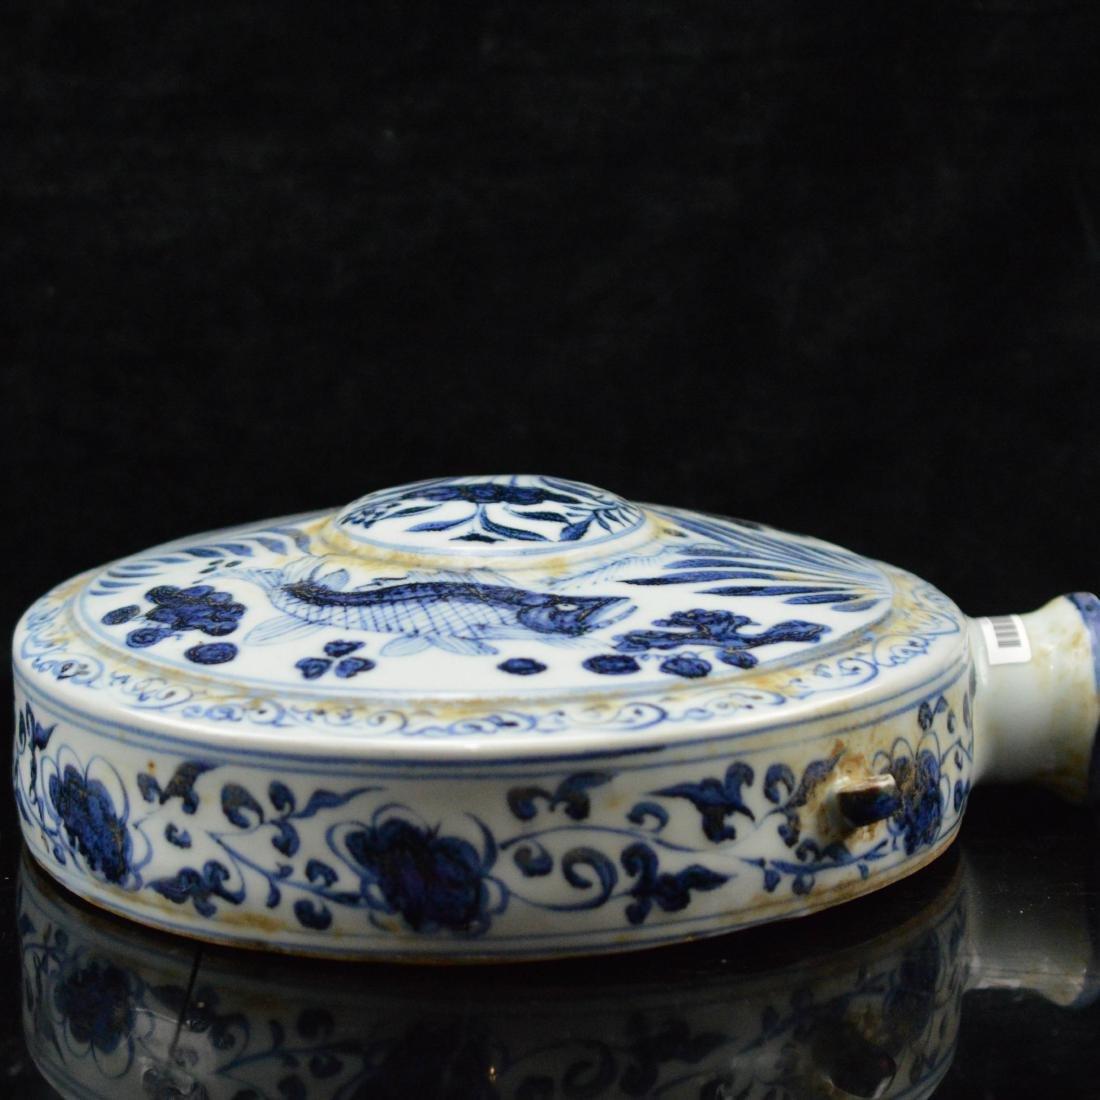 Blue and white wall porcelain vase